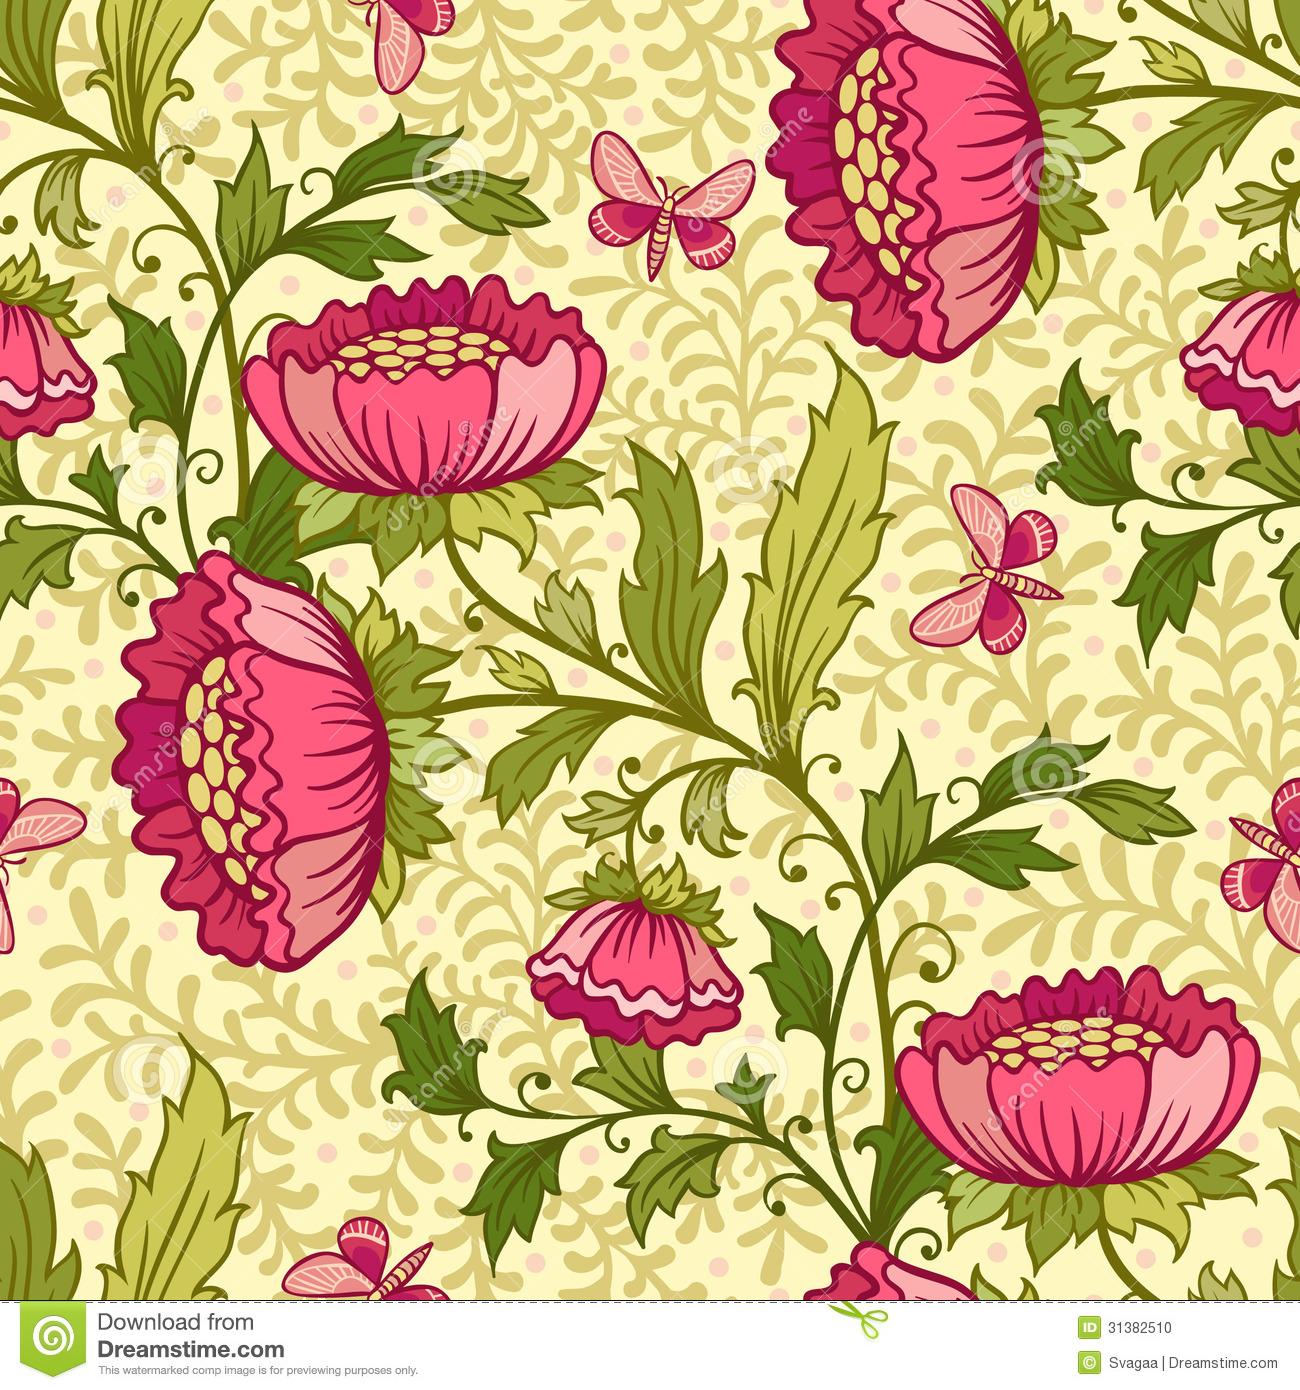 Vintage Flower Pattern Wallpaper Wallpaper seam 1300x1390